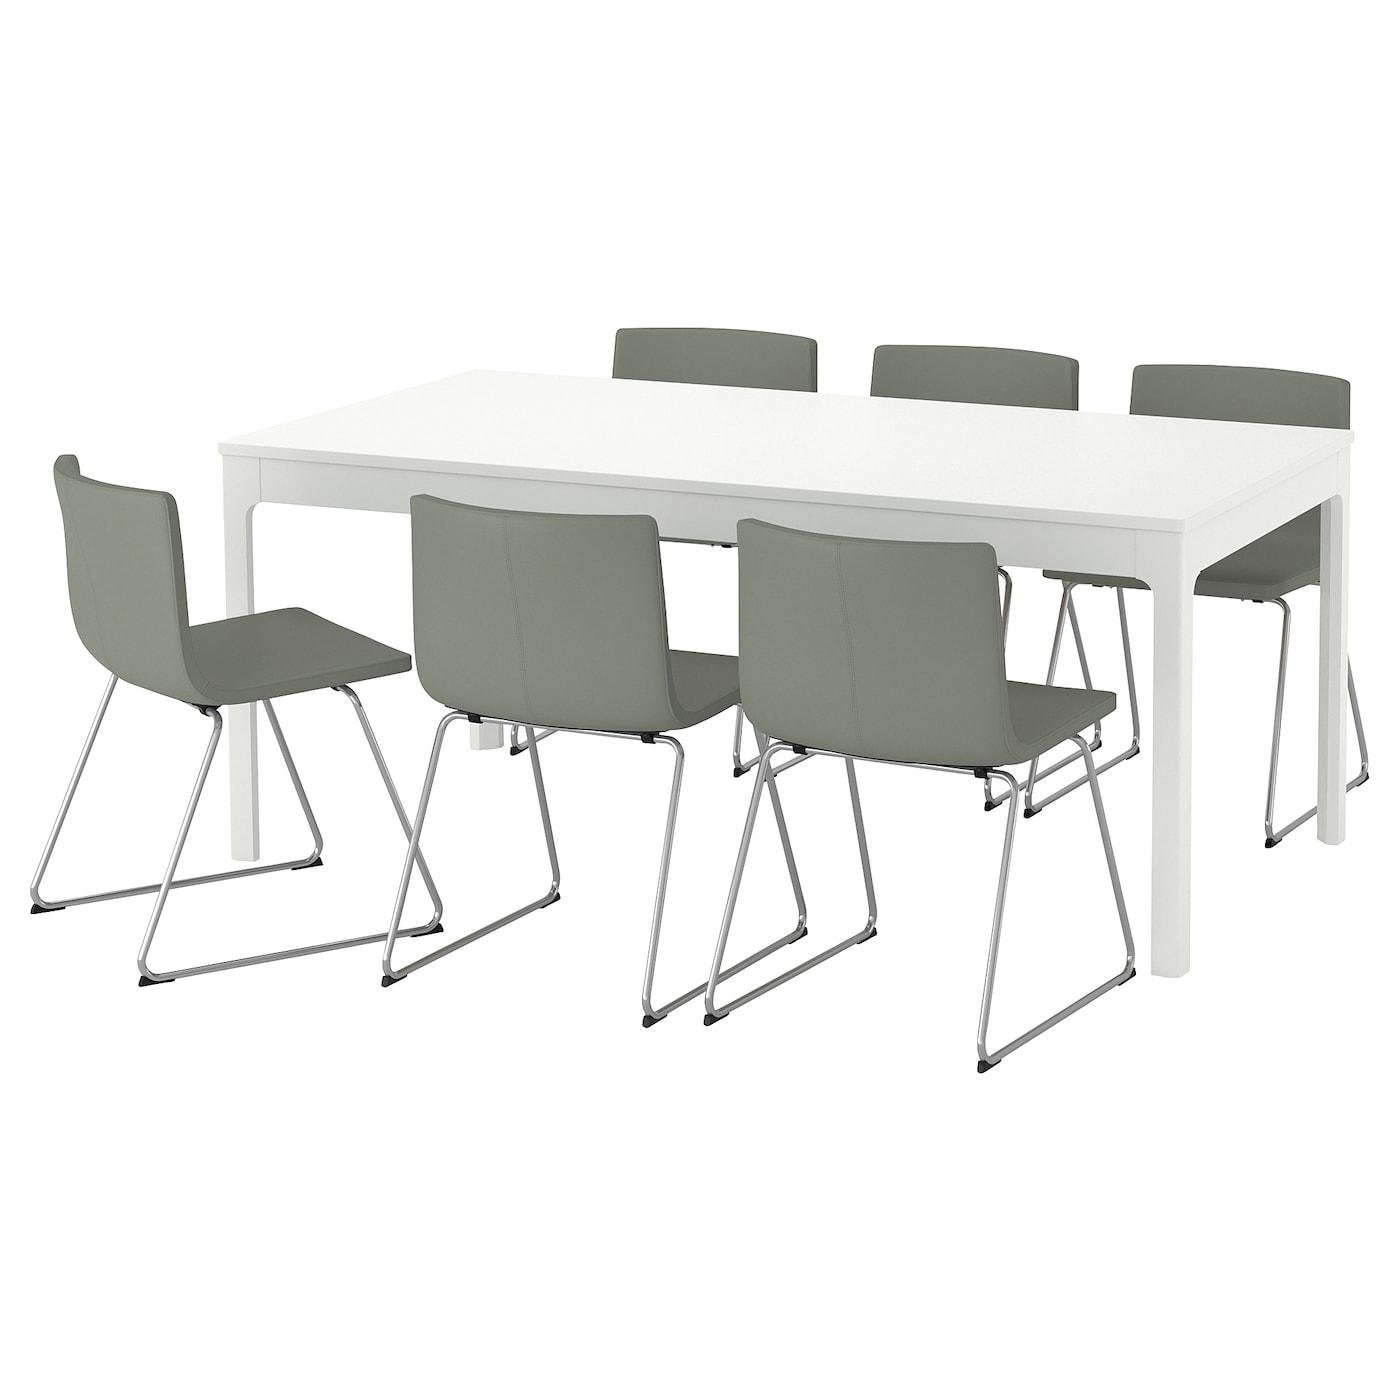 Bernhard ekedalen table et 6 chaises blanc 180 240 cm ikea for Chaise bernhard ikea